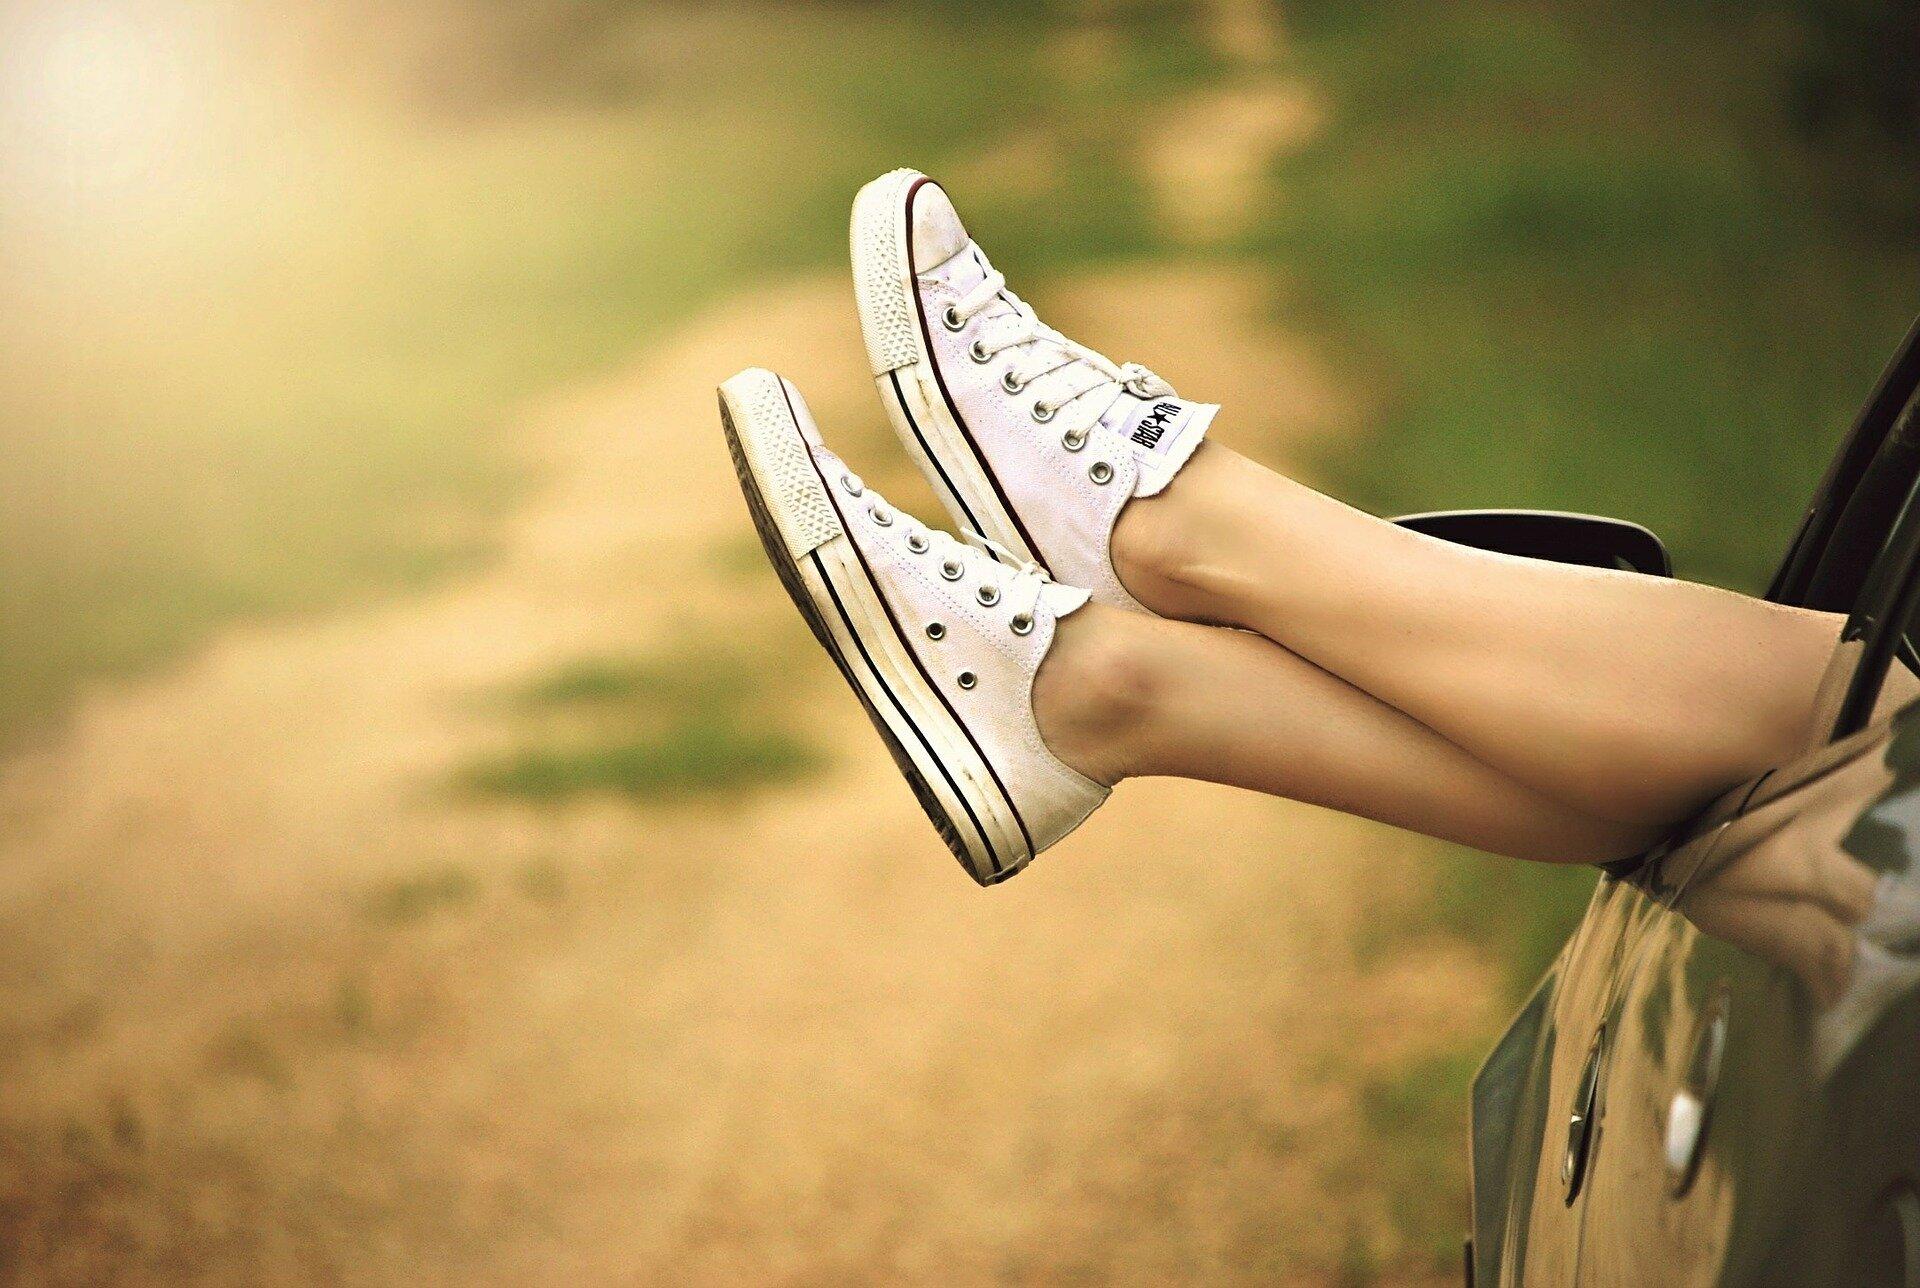 shoes-434918_1920.jpg